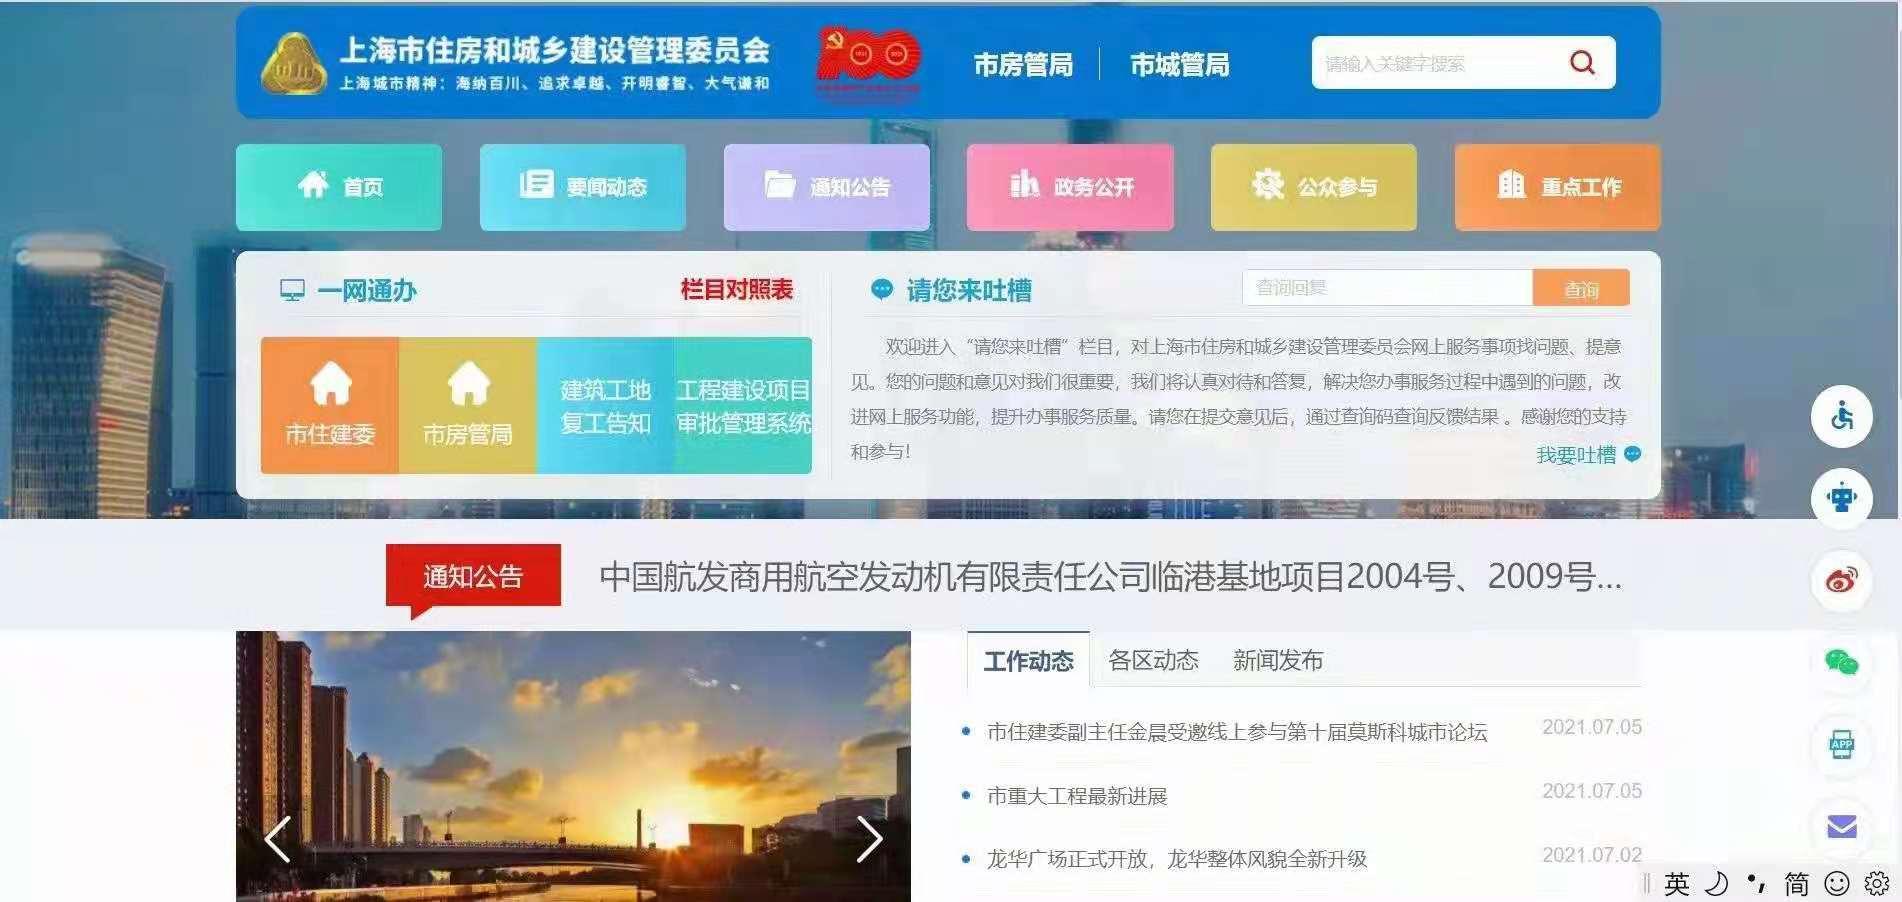 <b>上海市jian设gong程实名制管理系统平台wo司已dui接</b>